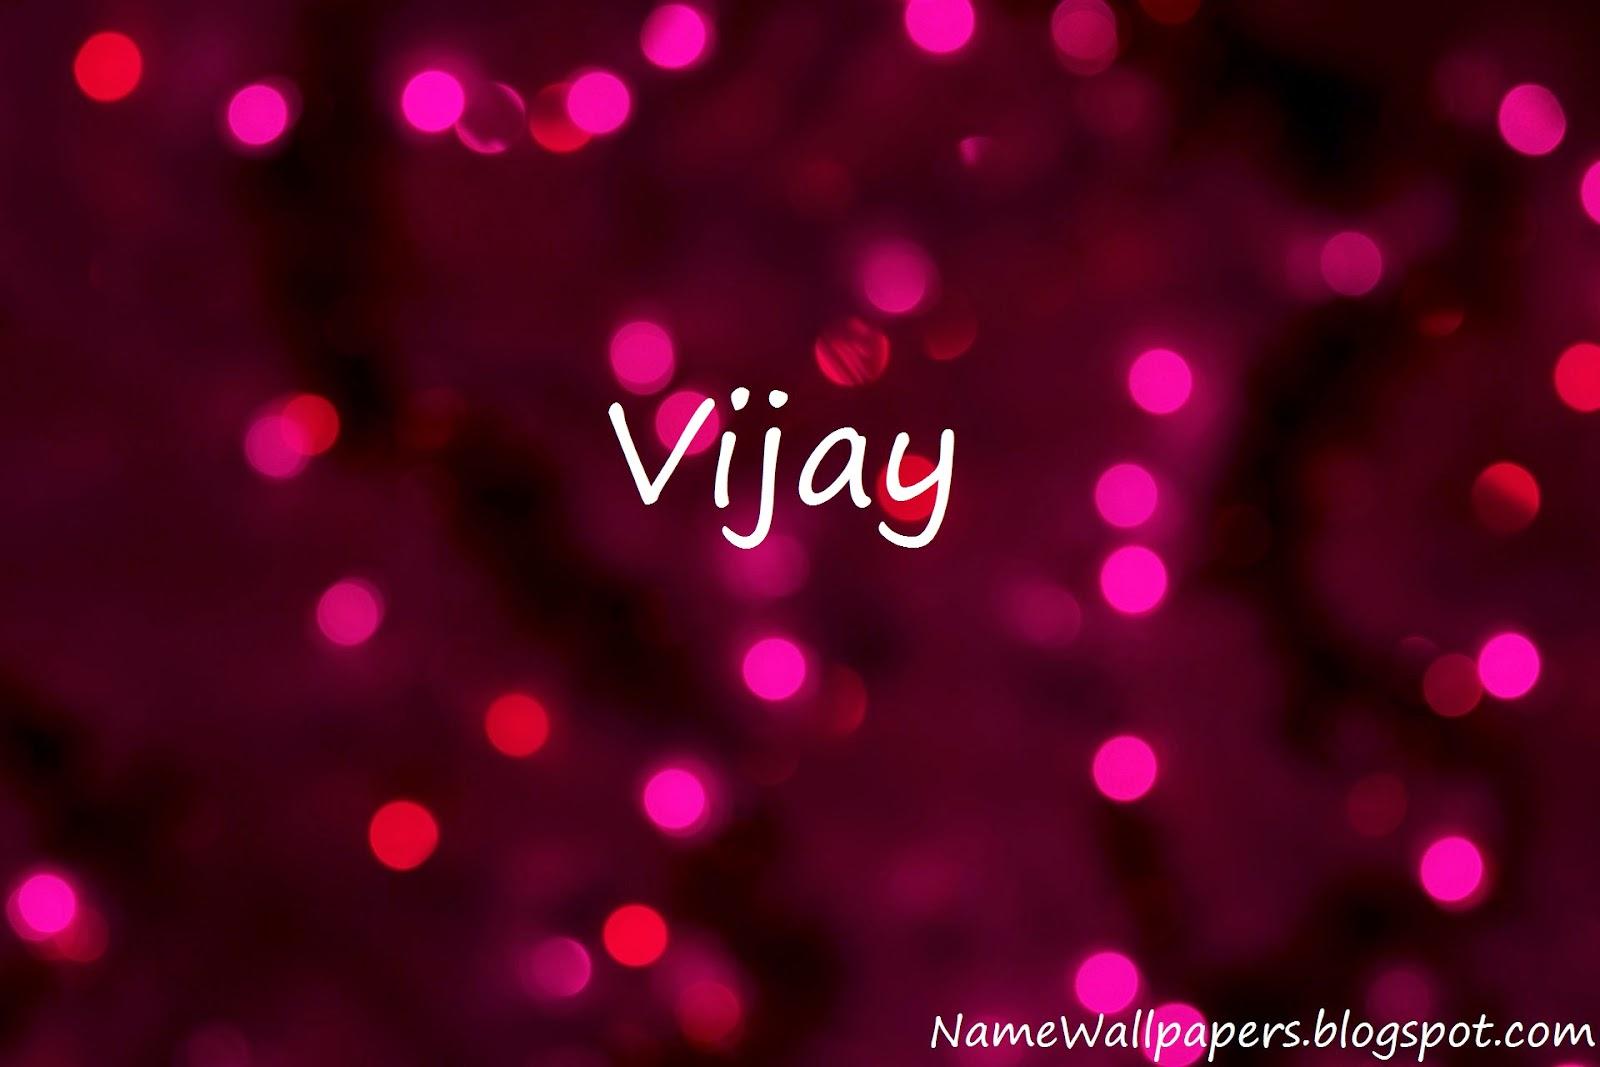 Vijay Name Wallpapers Vijay Name Wallpaper Urdu Name Meaning Name